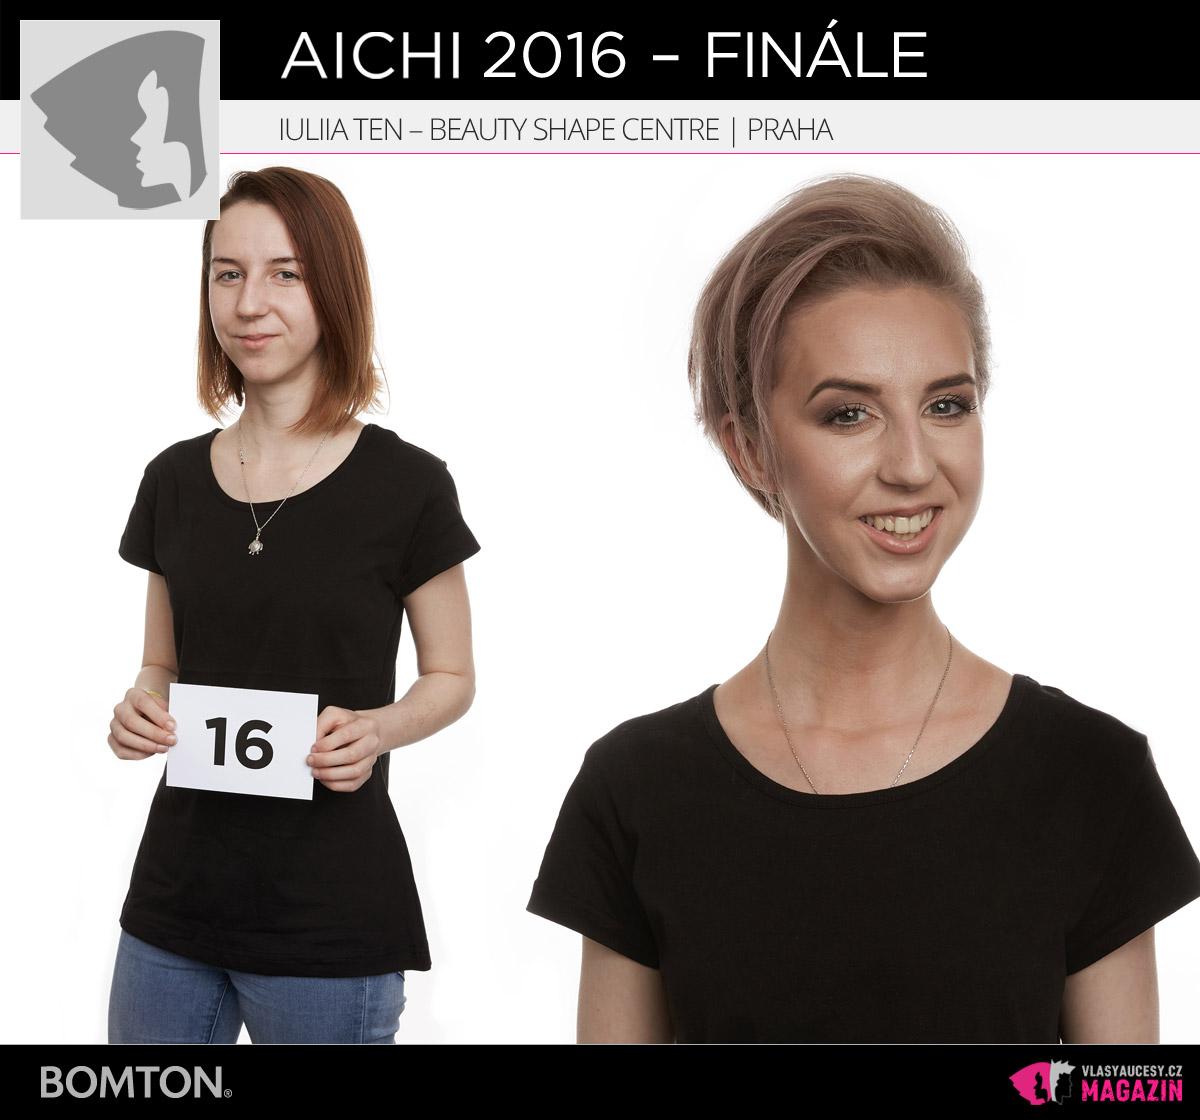 Semifinálová proměna AICHI 2016: Iuliia Ten, Beauty Shape Centre, Praha